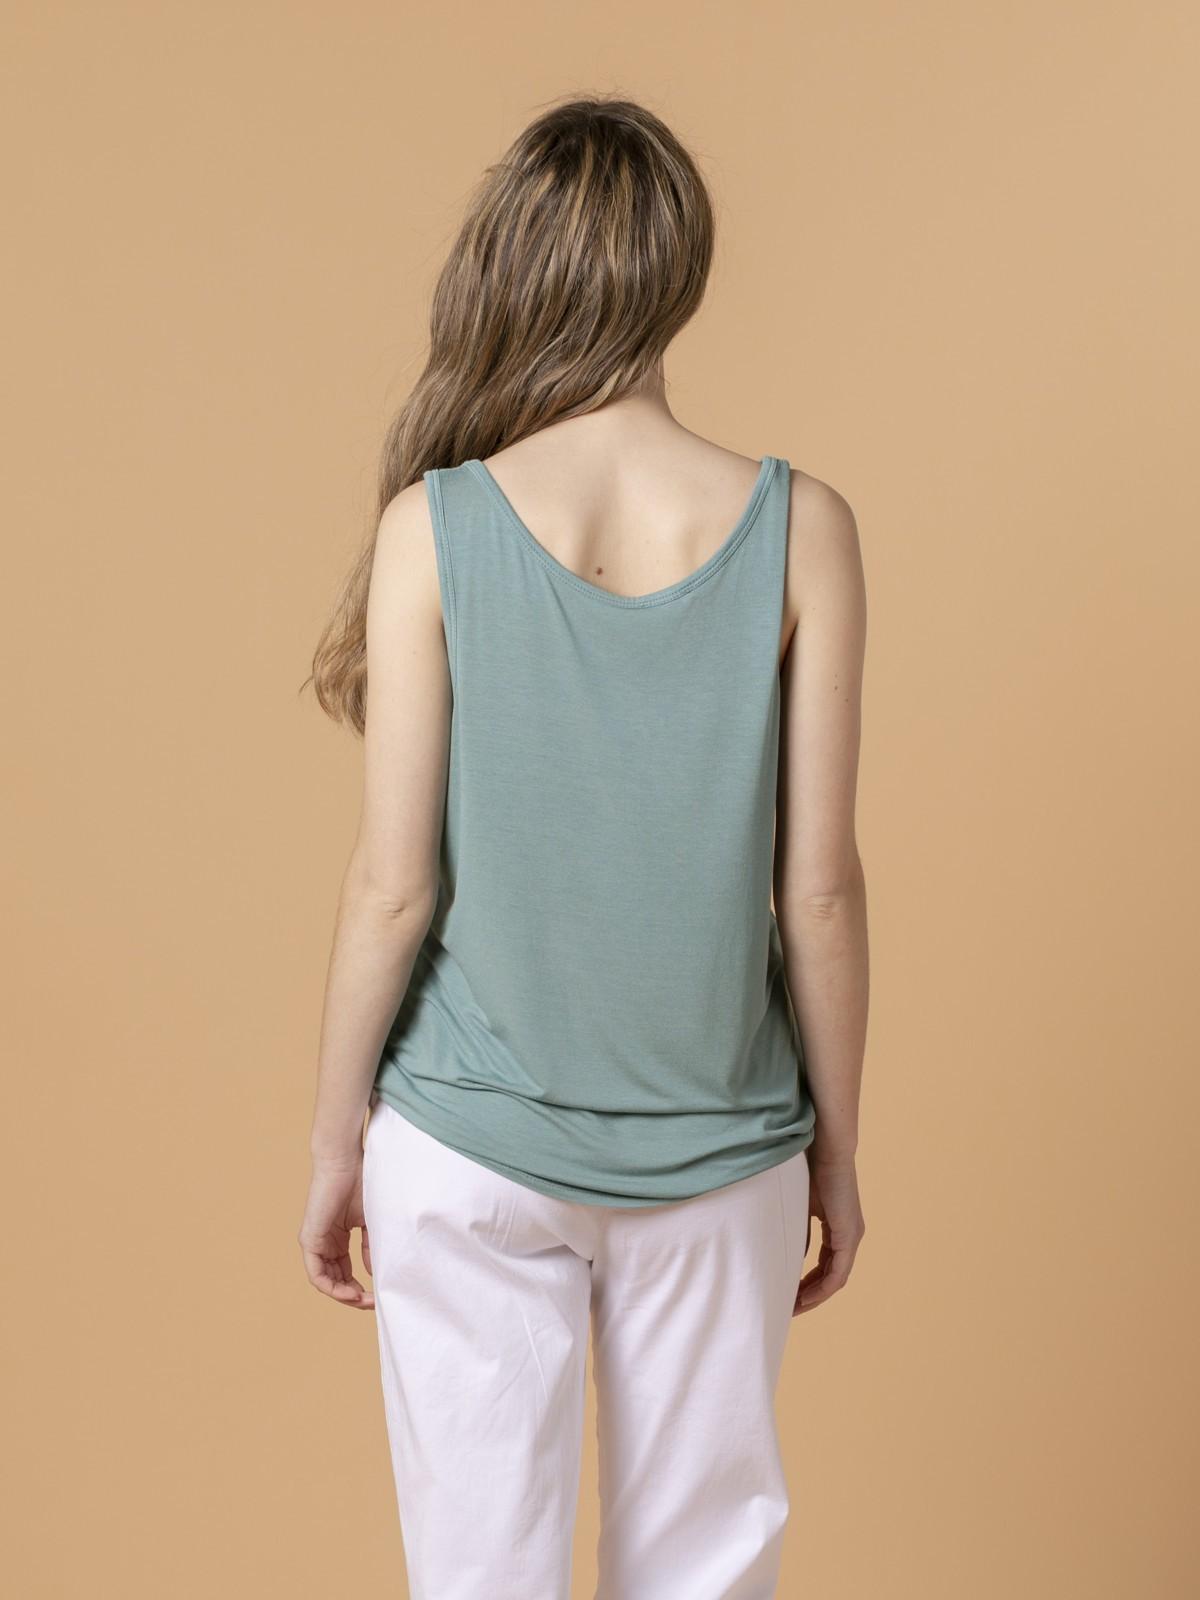 Camiseta mujer tirante ancho Verde